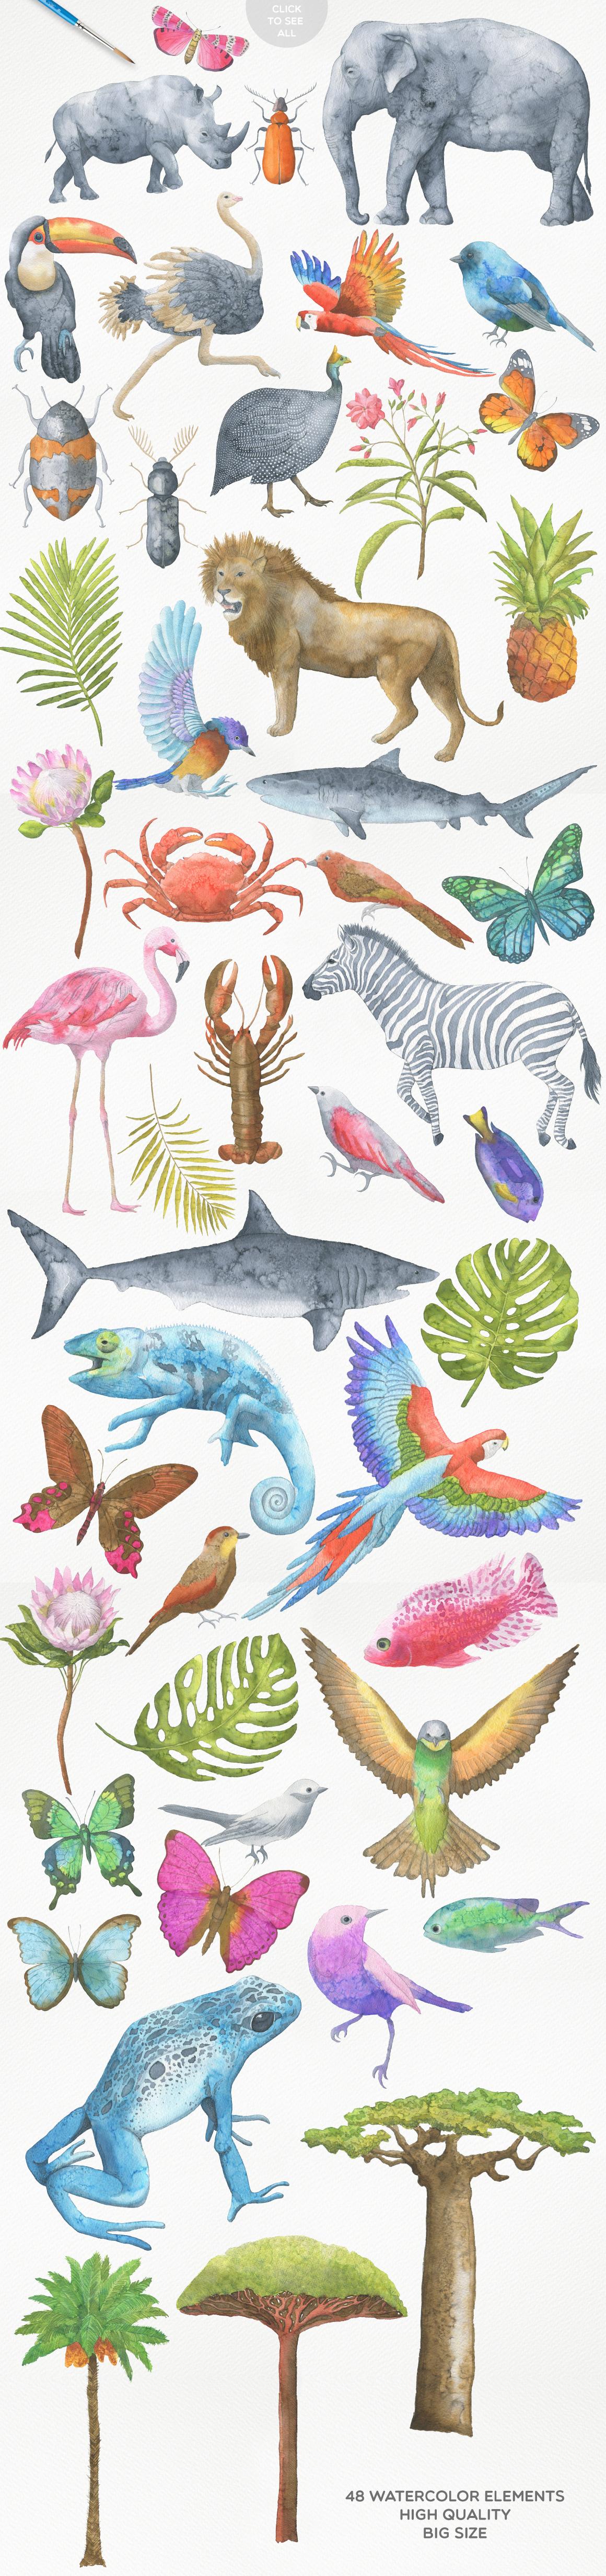 Safari Watercolor Collection example image 2